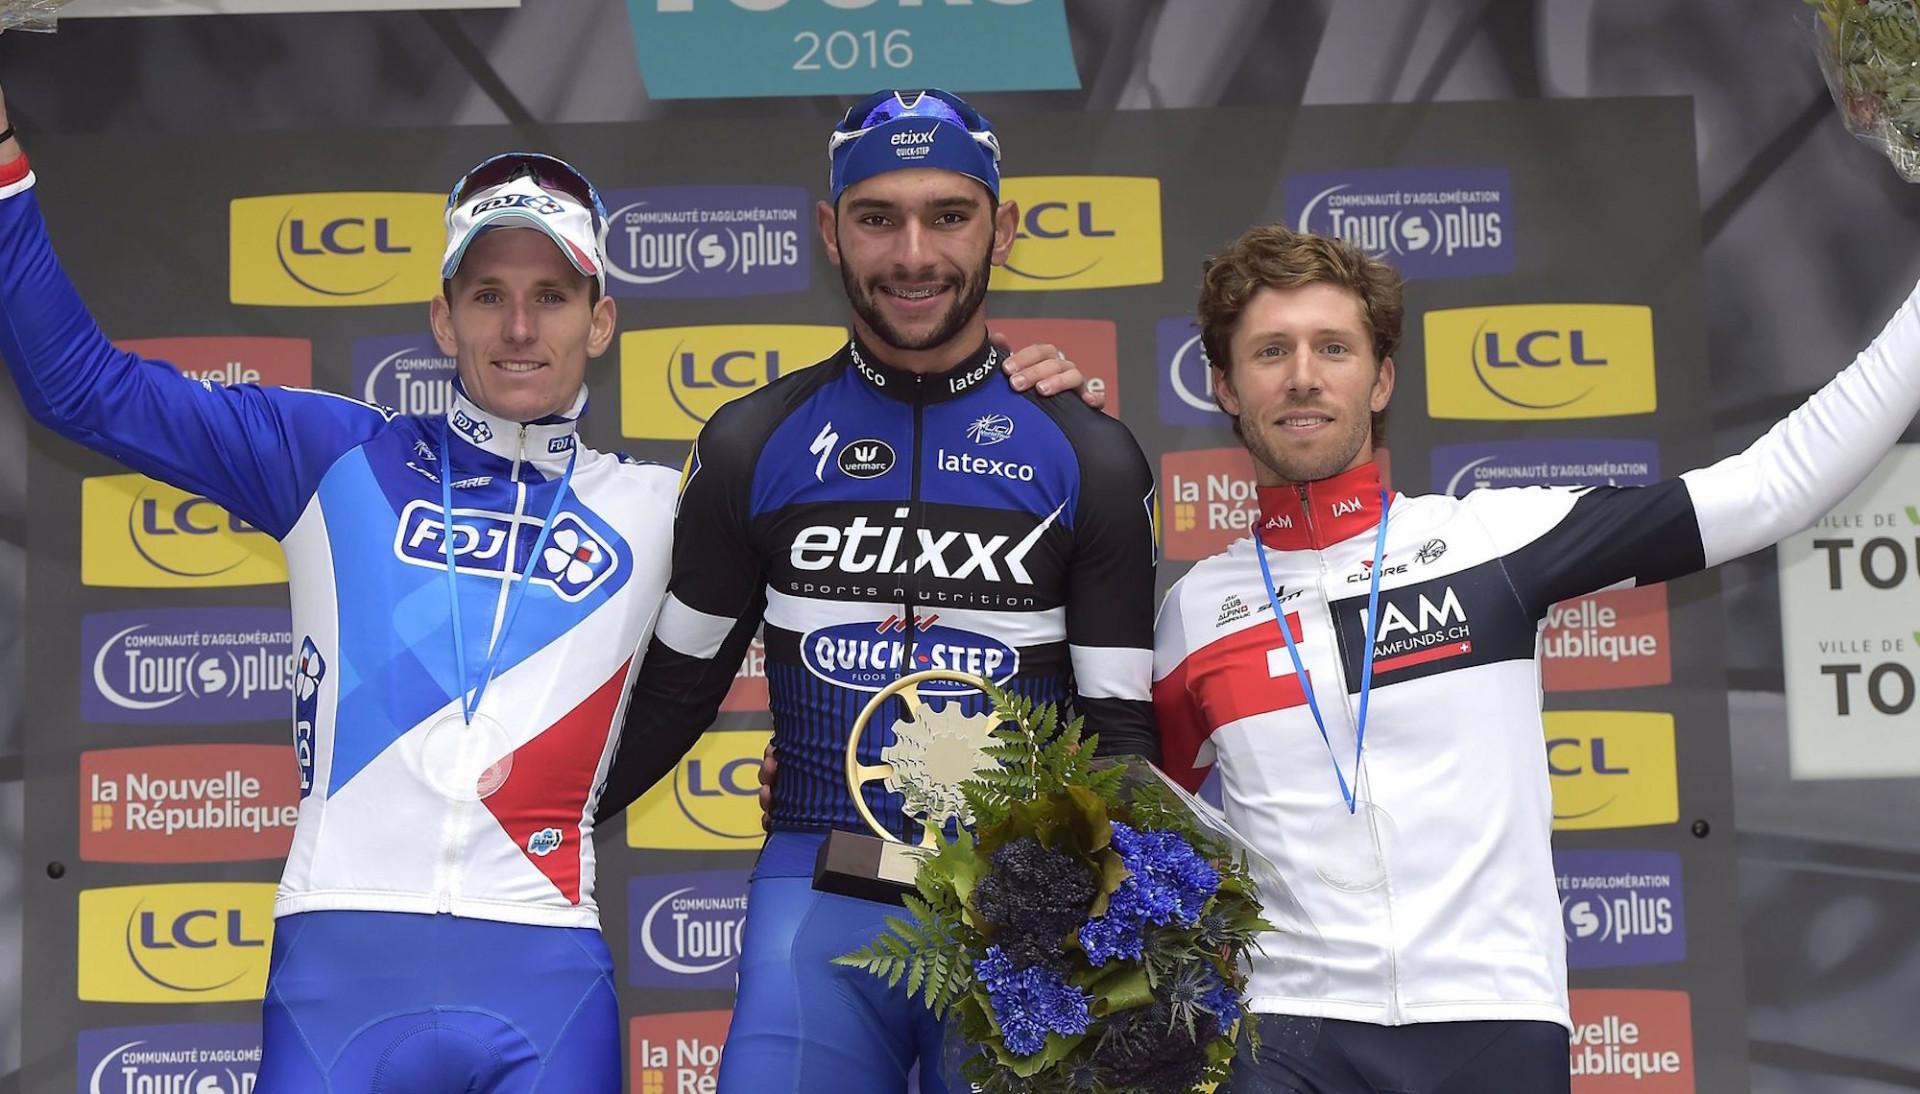 Paris-Tours – Ein letztes Podest für IAM Cycling